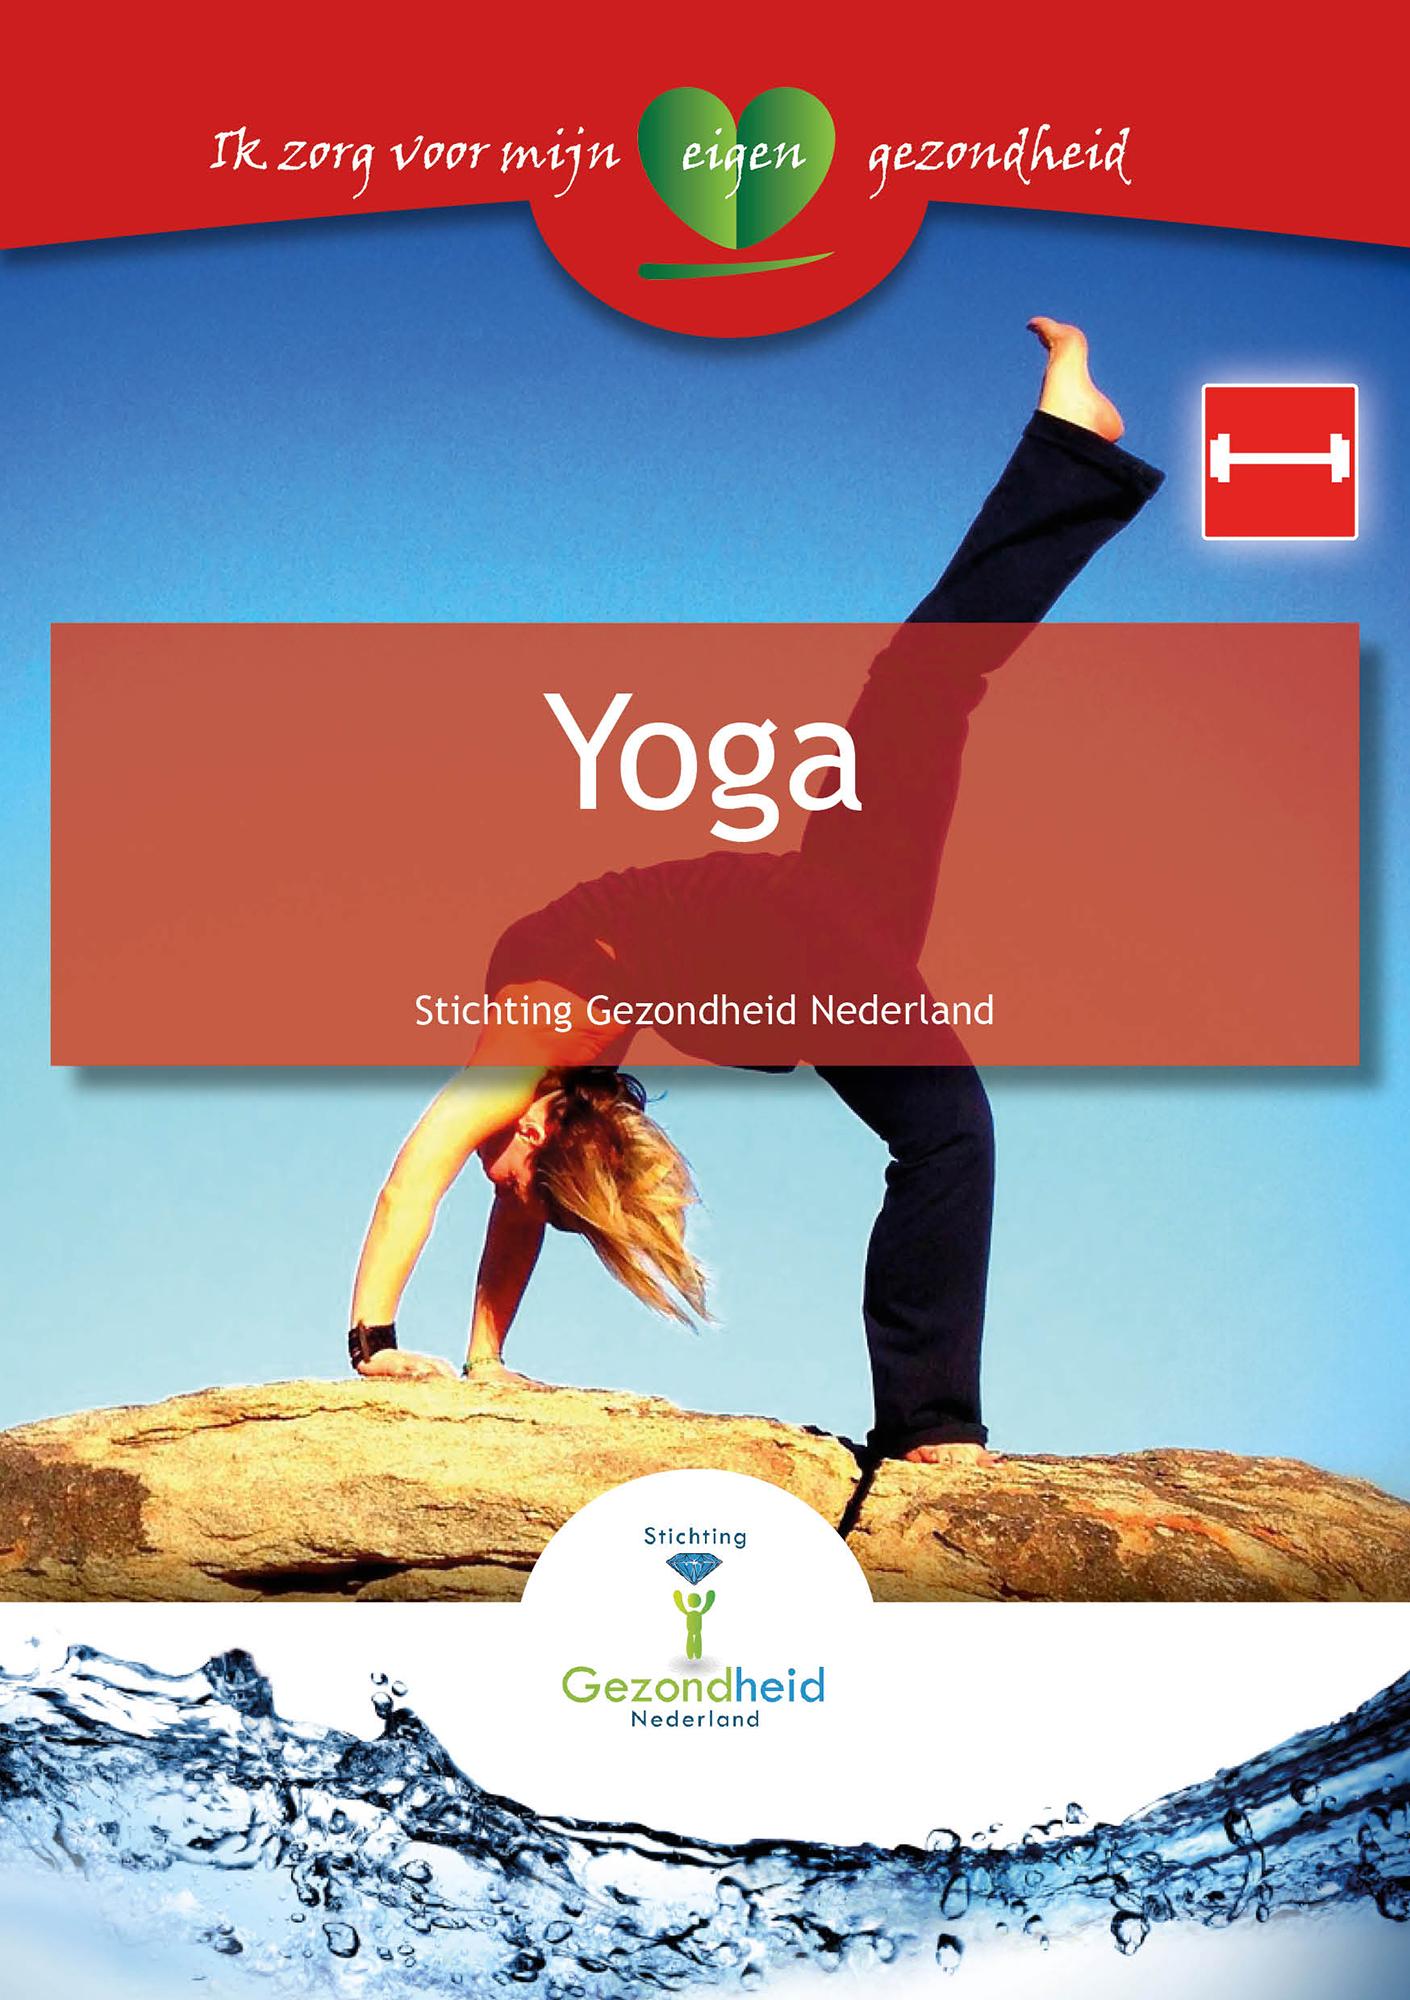 Boek over Yoga